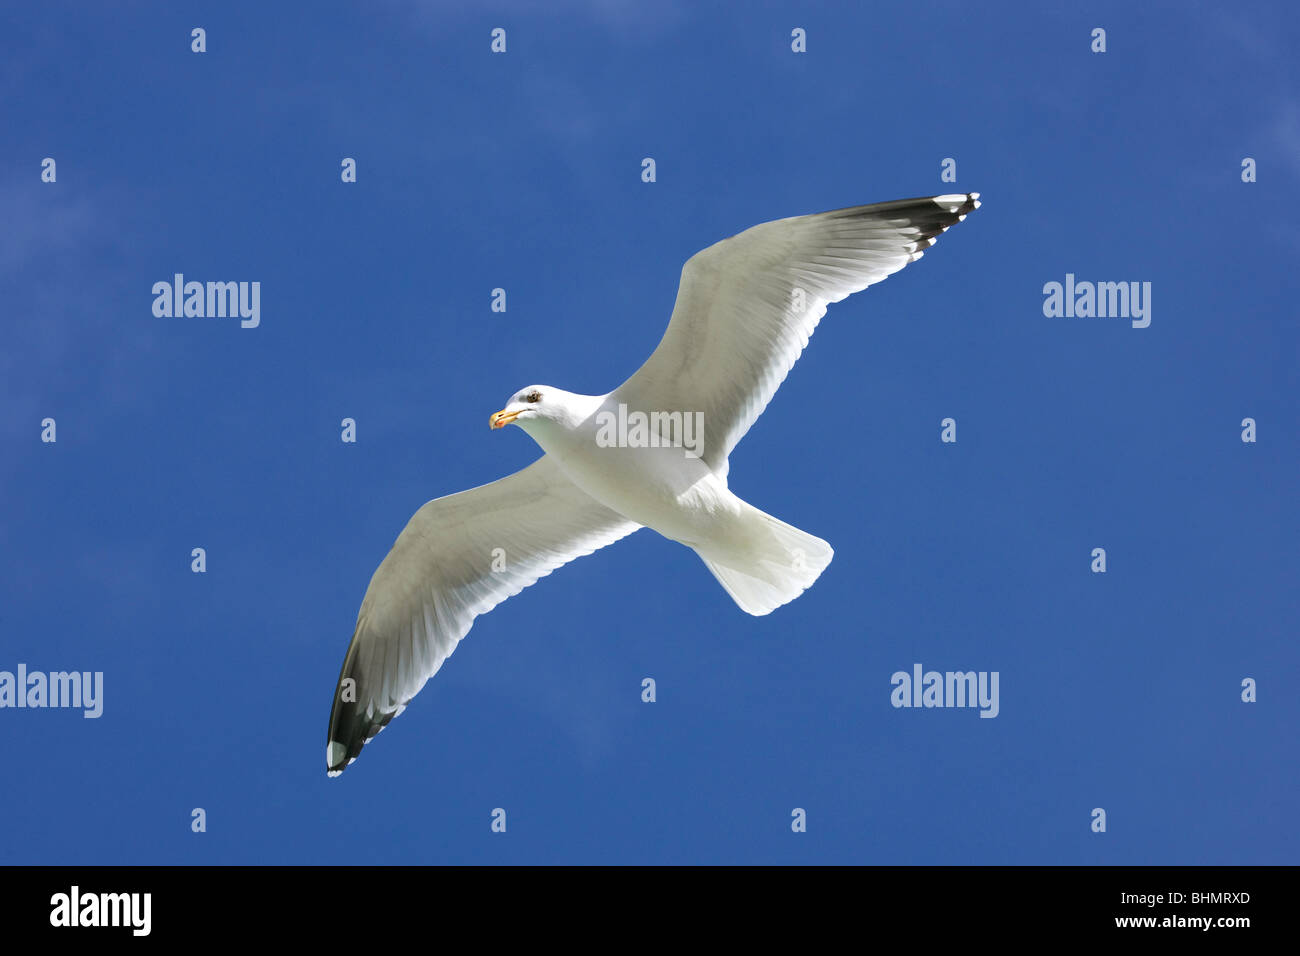 Herring gull (Larus argentatus) in flight against blue sky Stock Photo